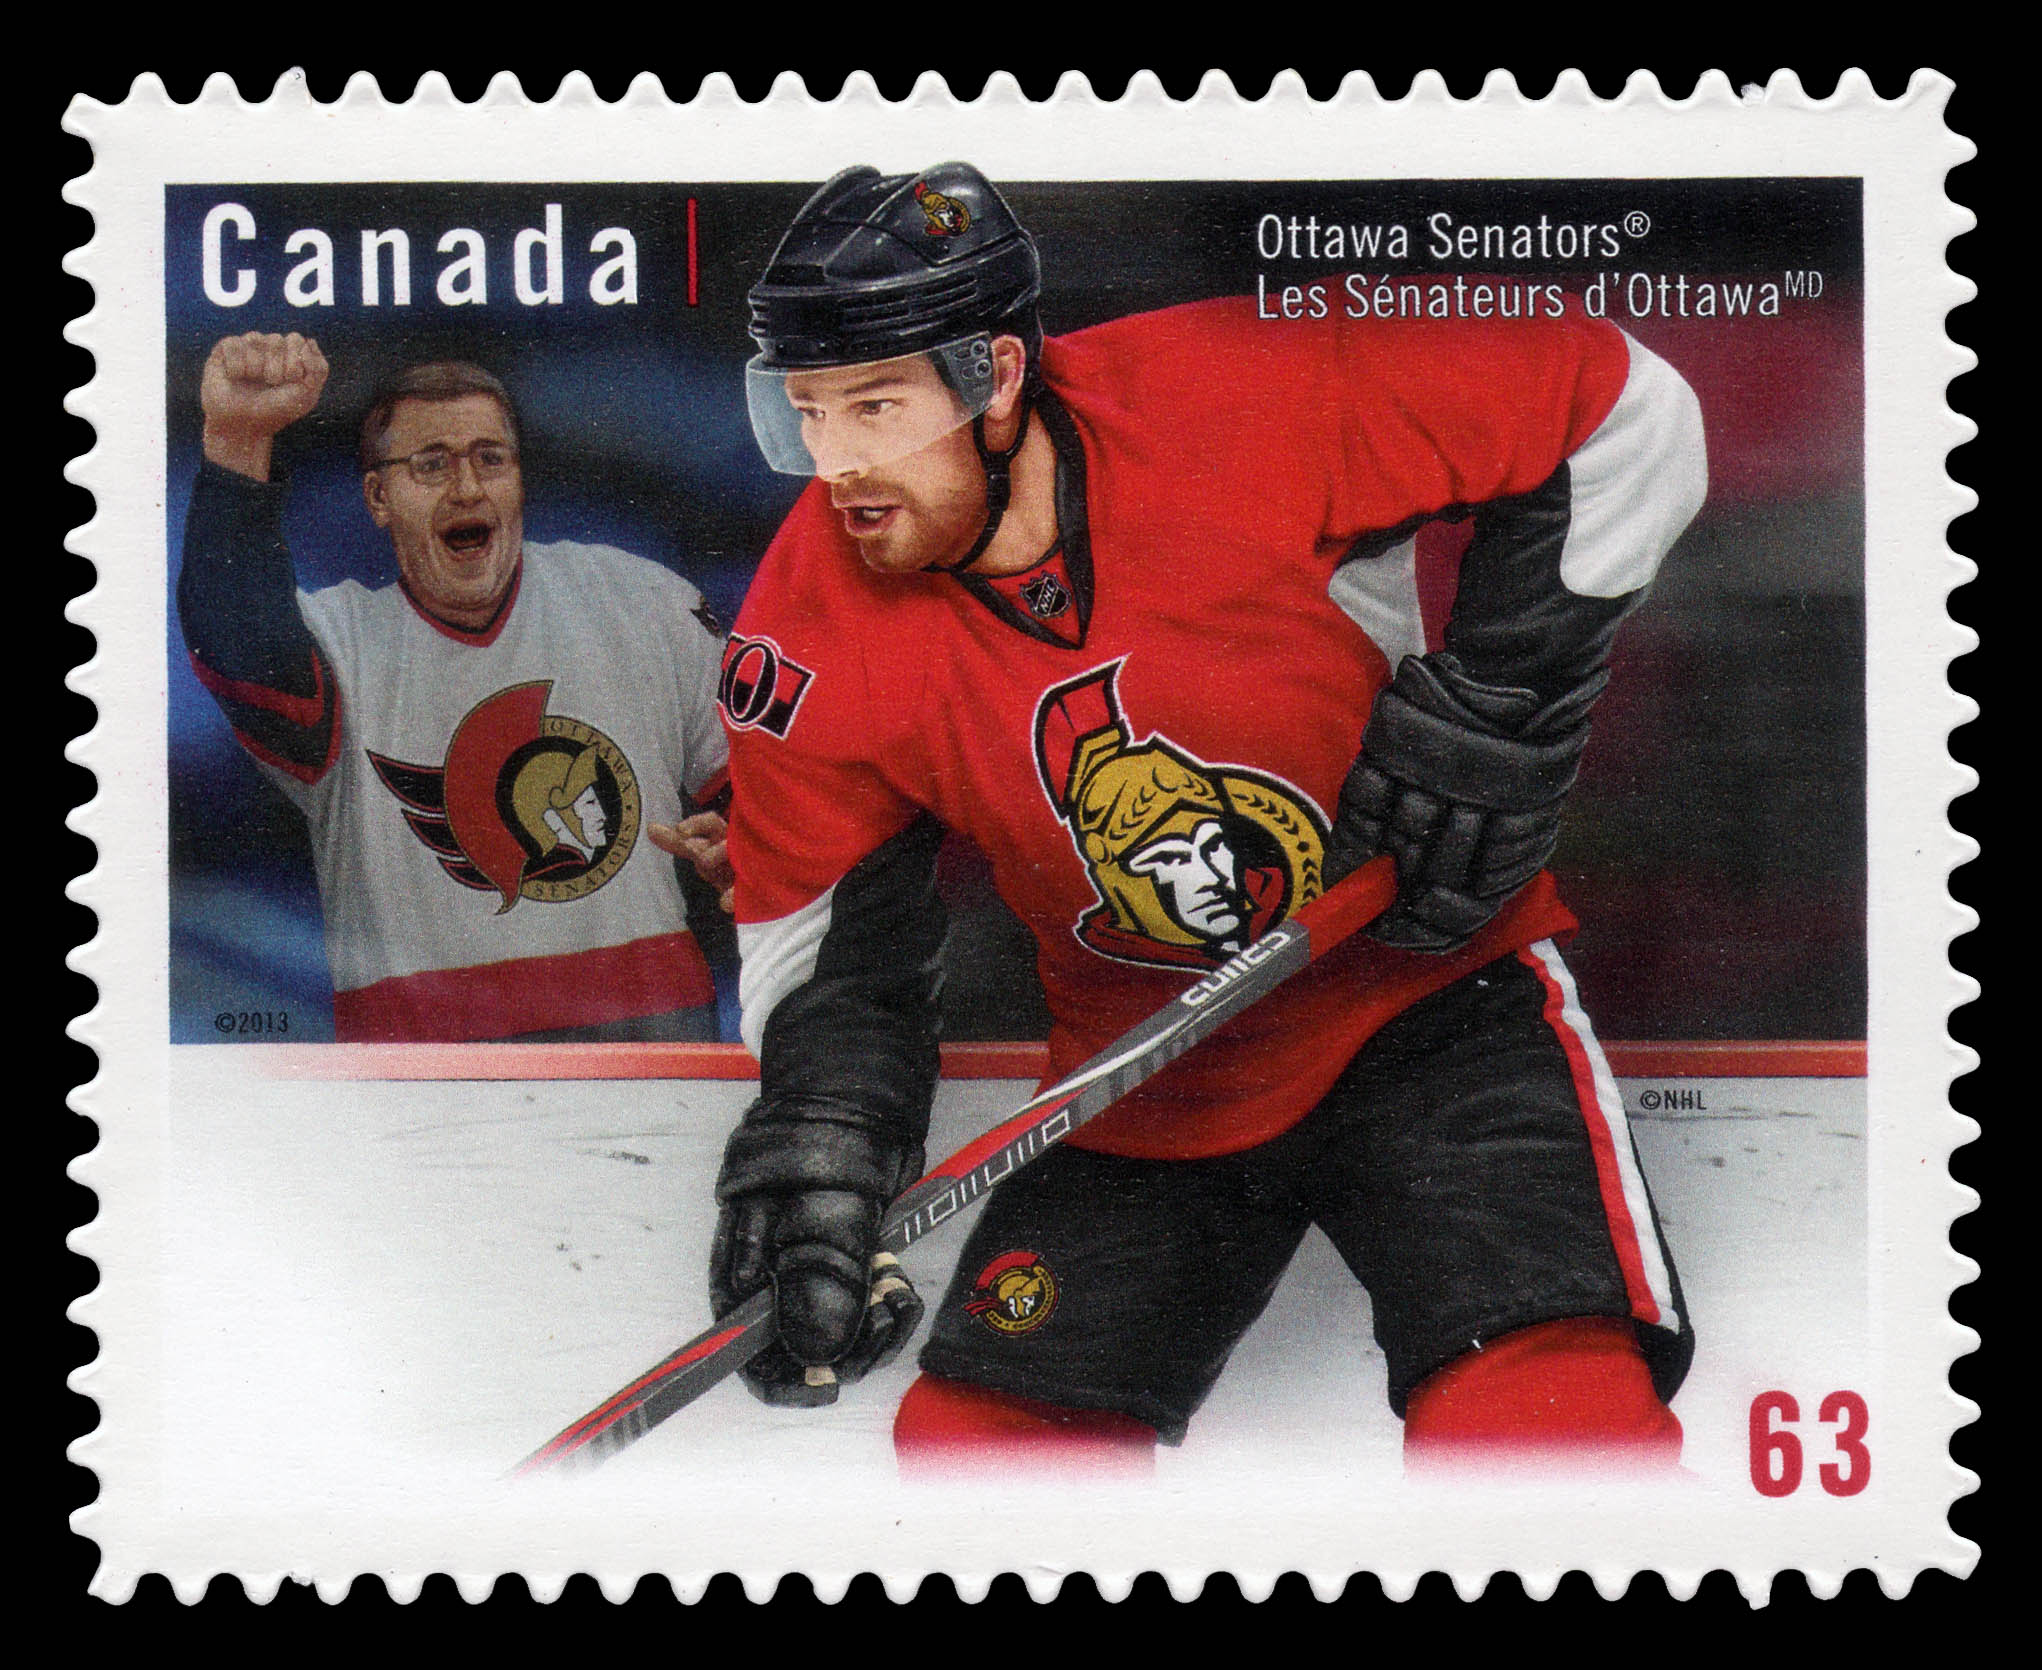 Ottawa Senators Canada Postage Stamp